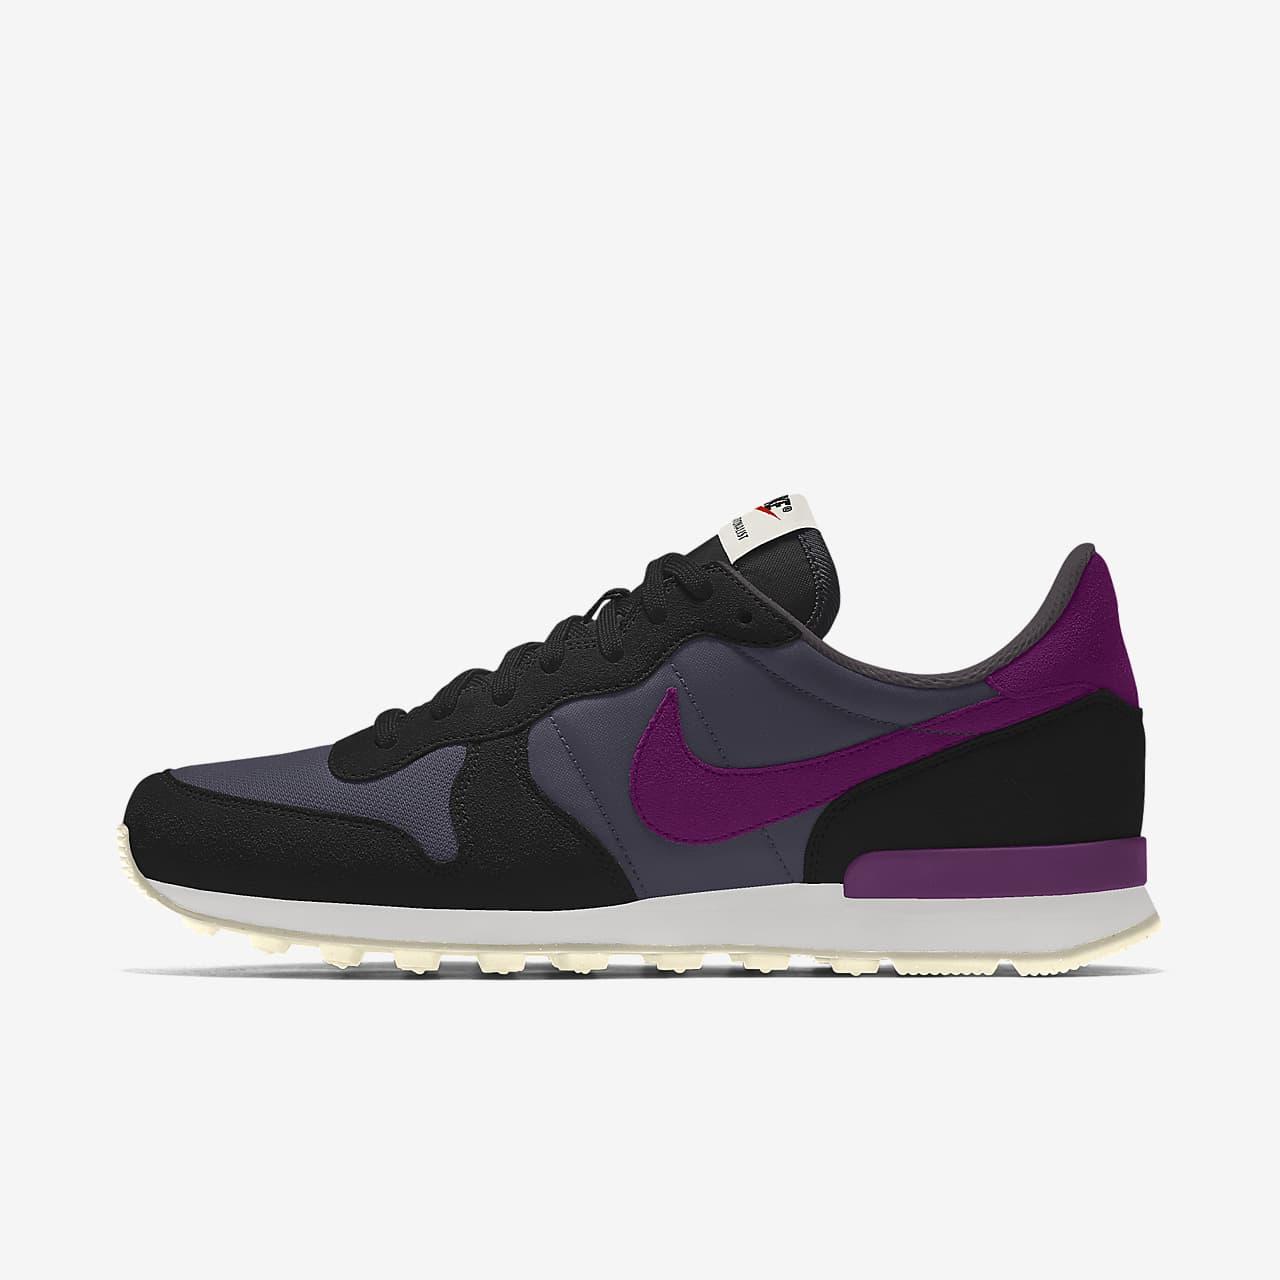 Nike Internationalist By You personalisierbarer Damenschuh